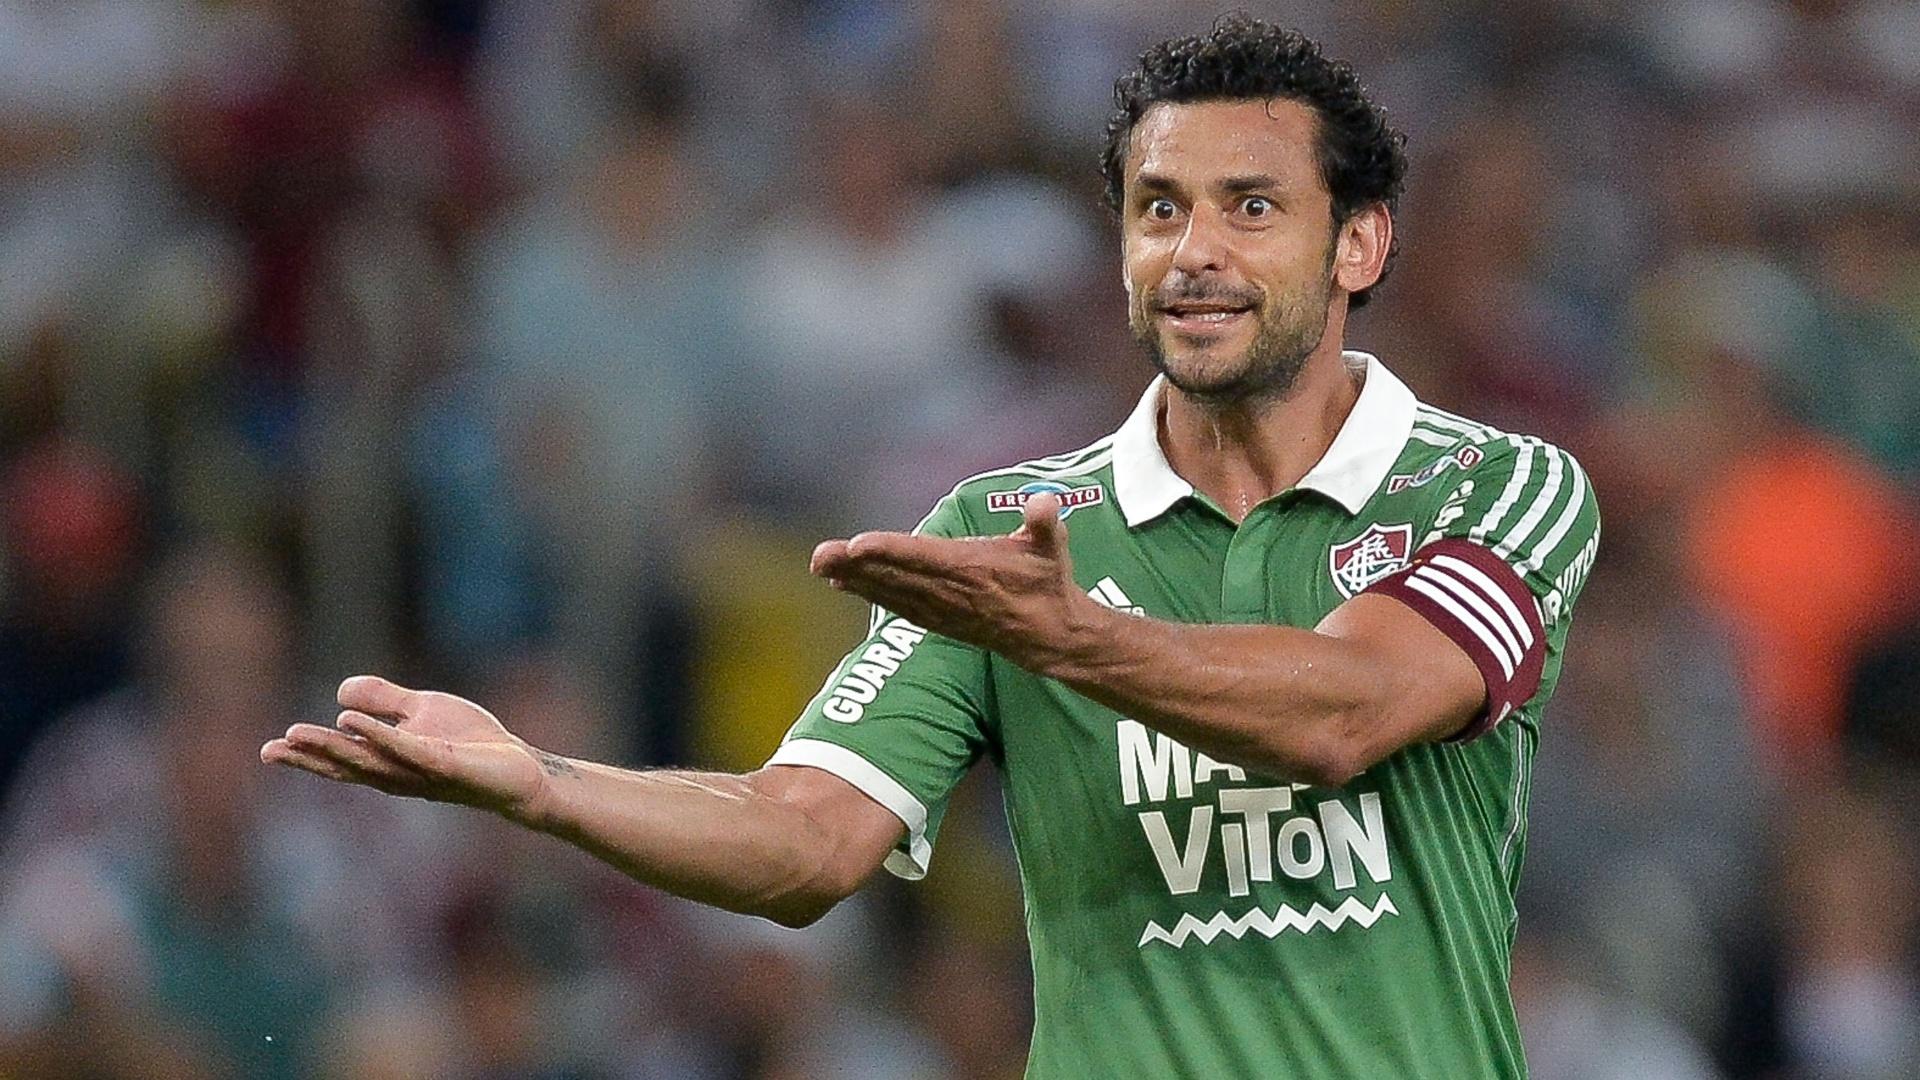 Fred gesticula durante jogo do Fluminense contra o Joinville